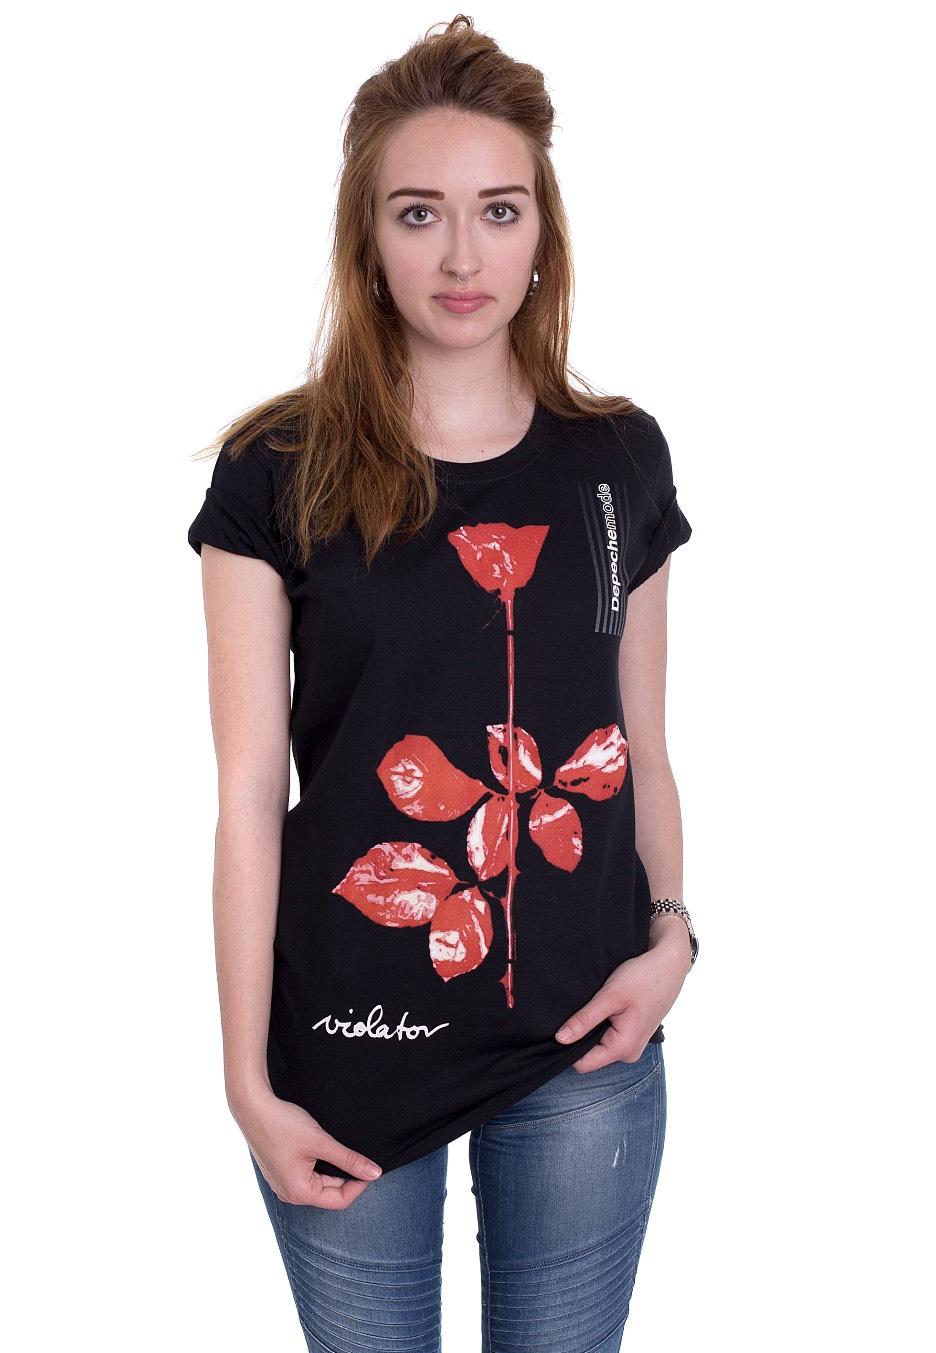 Depeche Mode Violator T Shirt